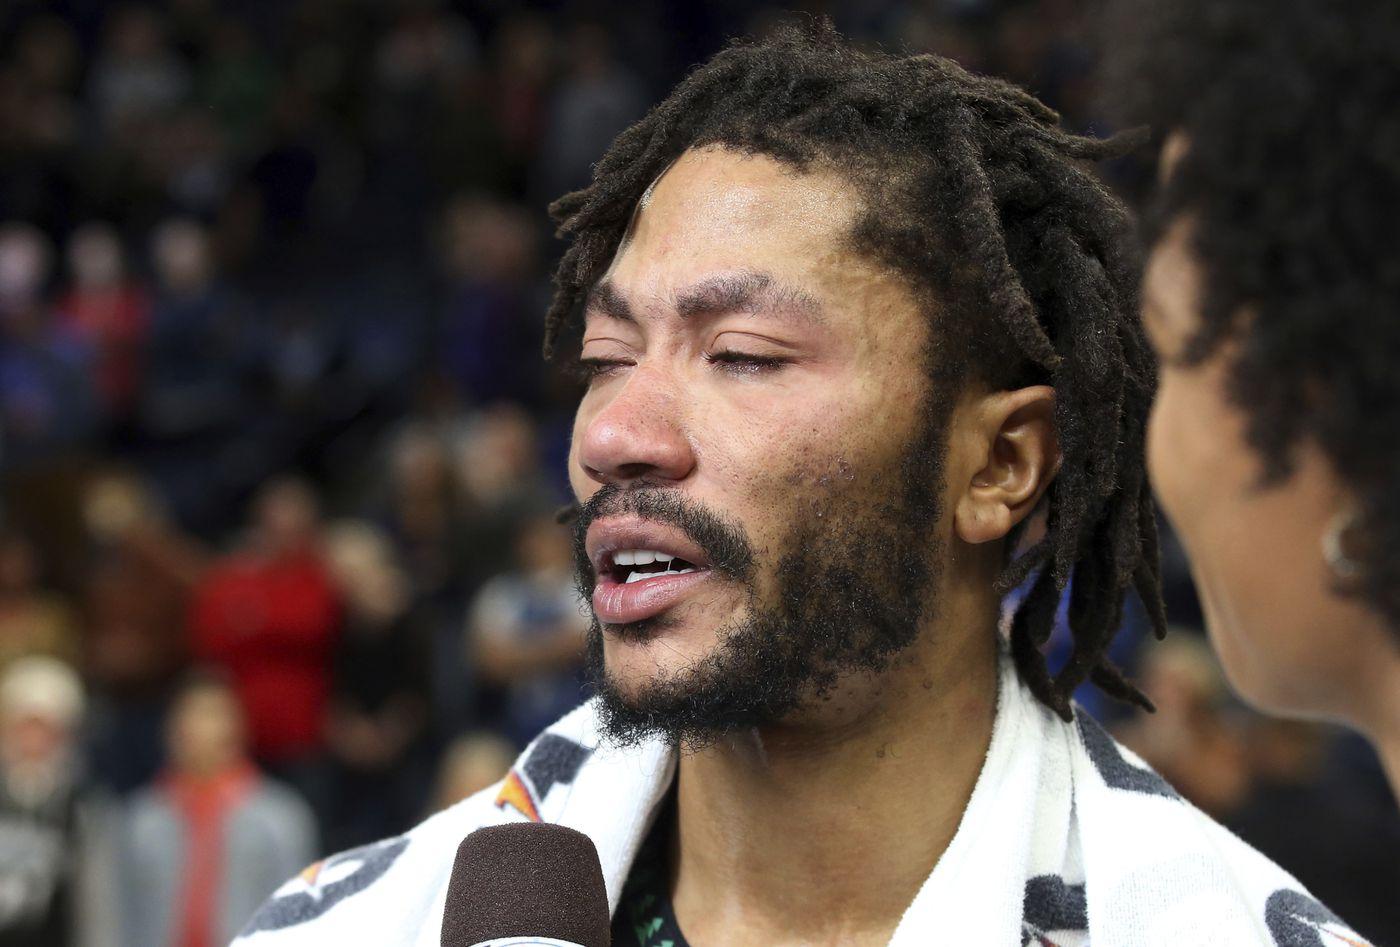 eccc70207d3 Minnesota Timberwolves  Derrick Rose is interviewed after he scored 50  points